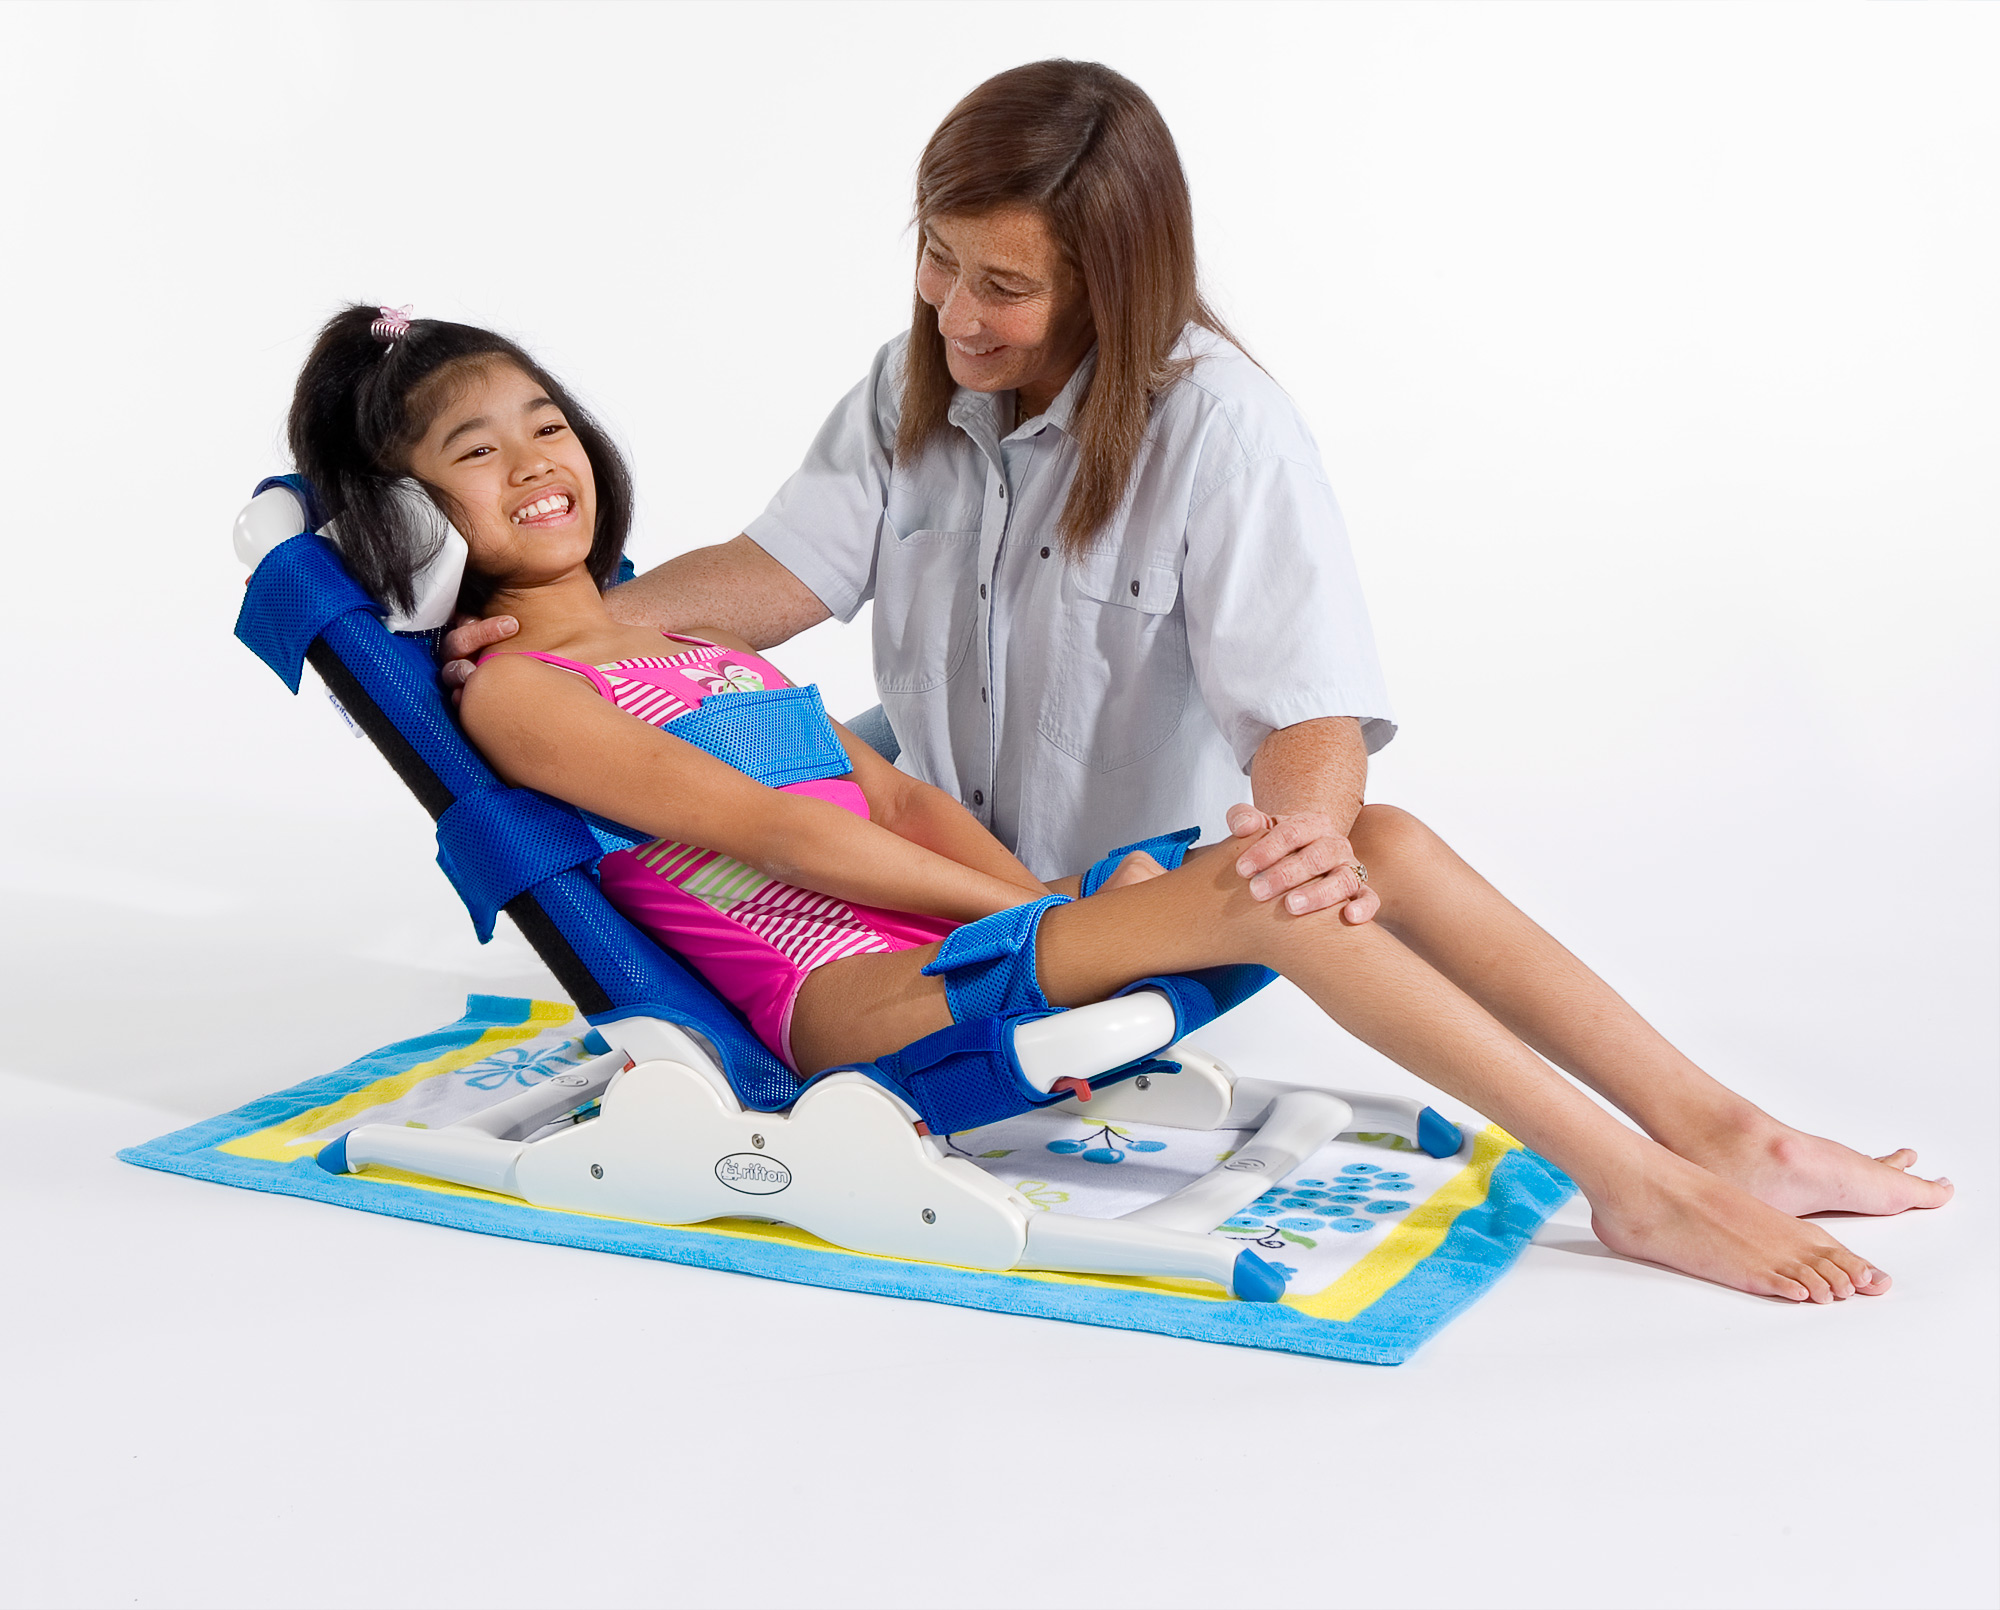 child bath images - usseek.com